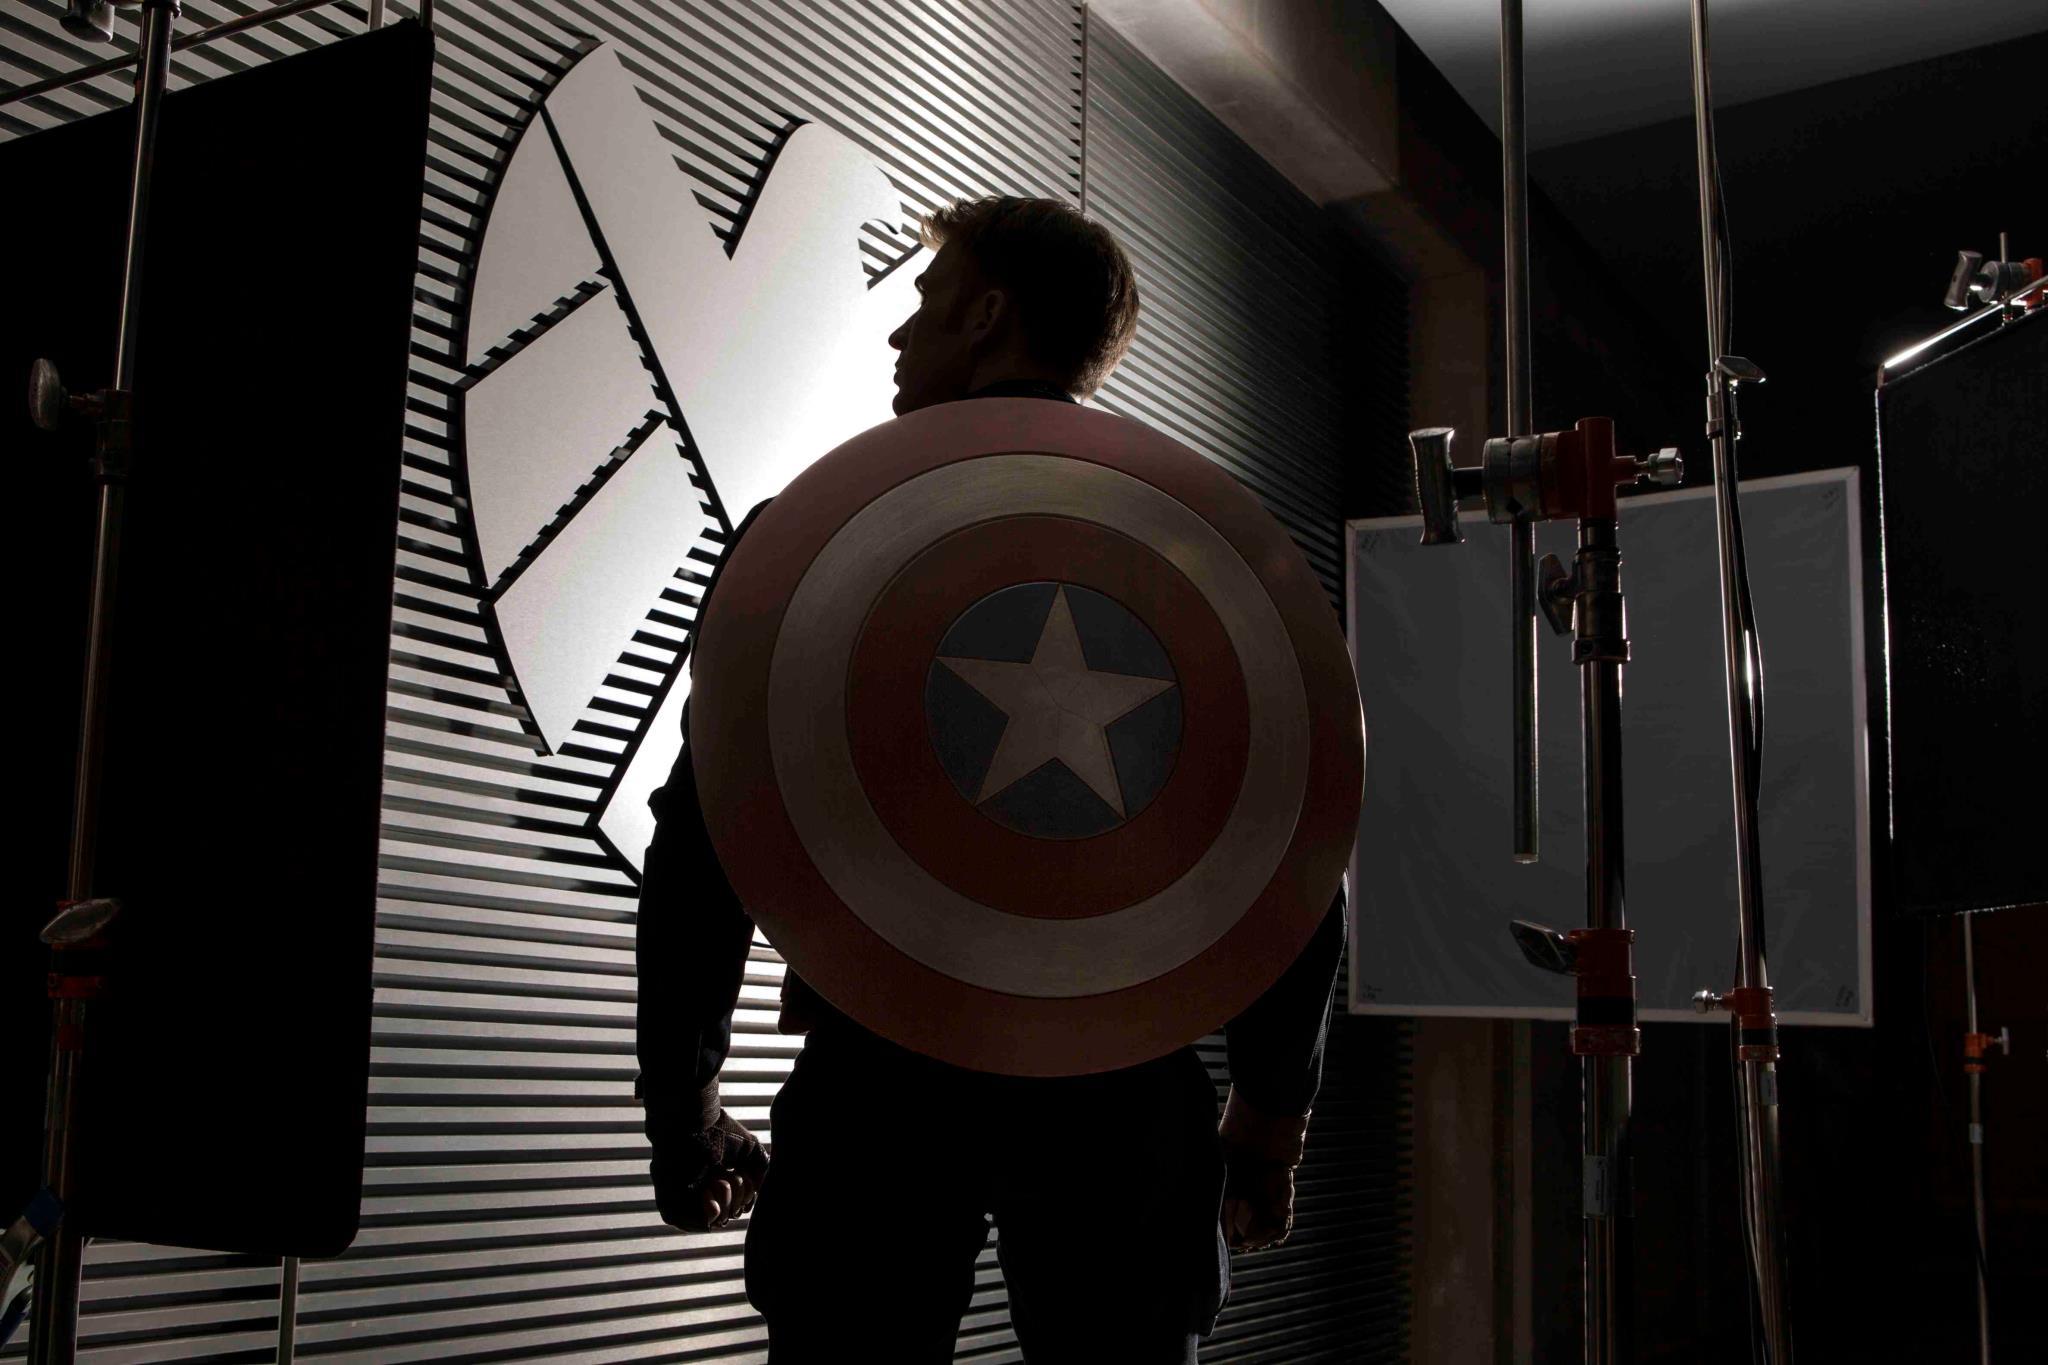 captain-america-the-winter-soldier-premiere-image